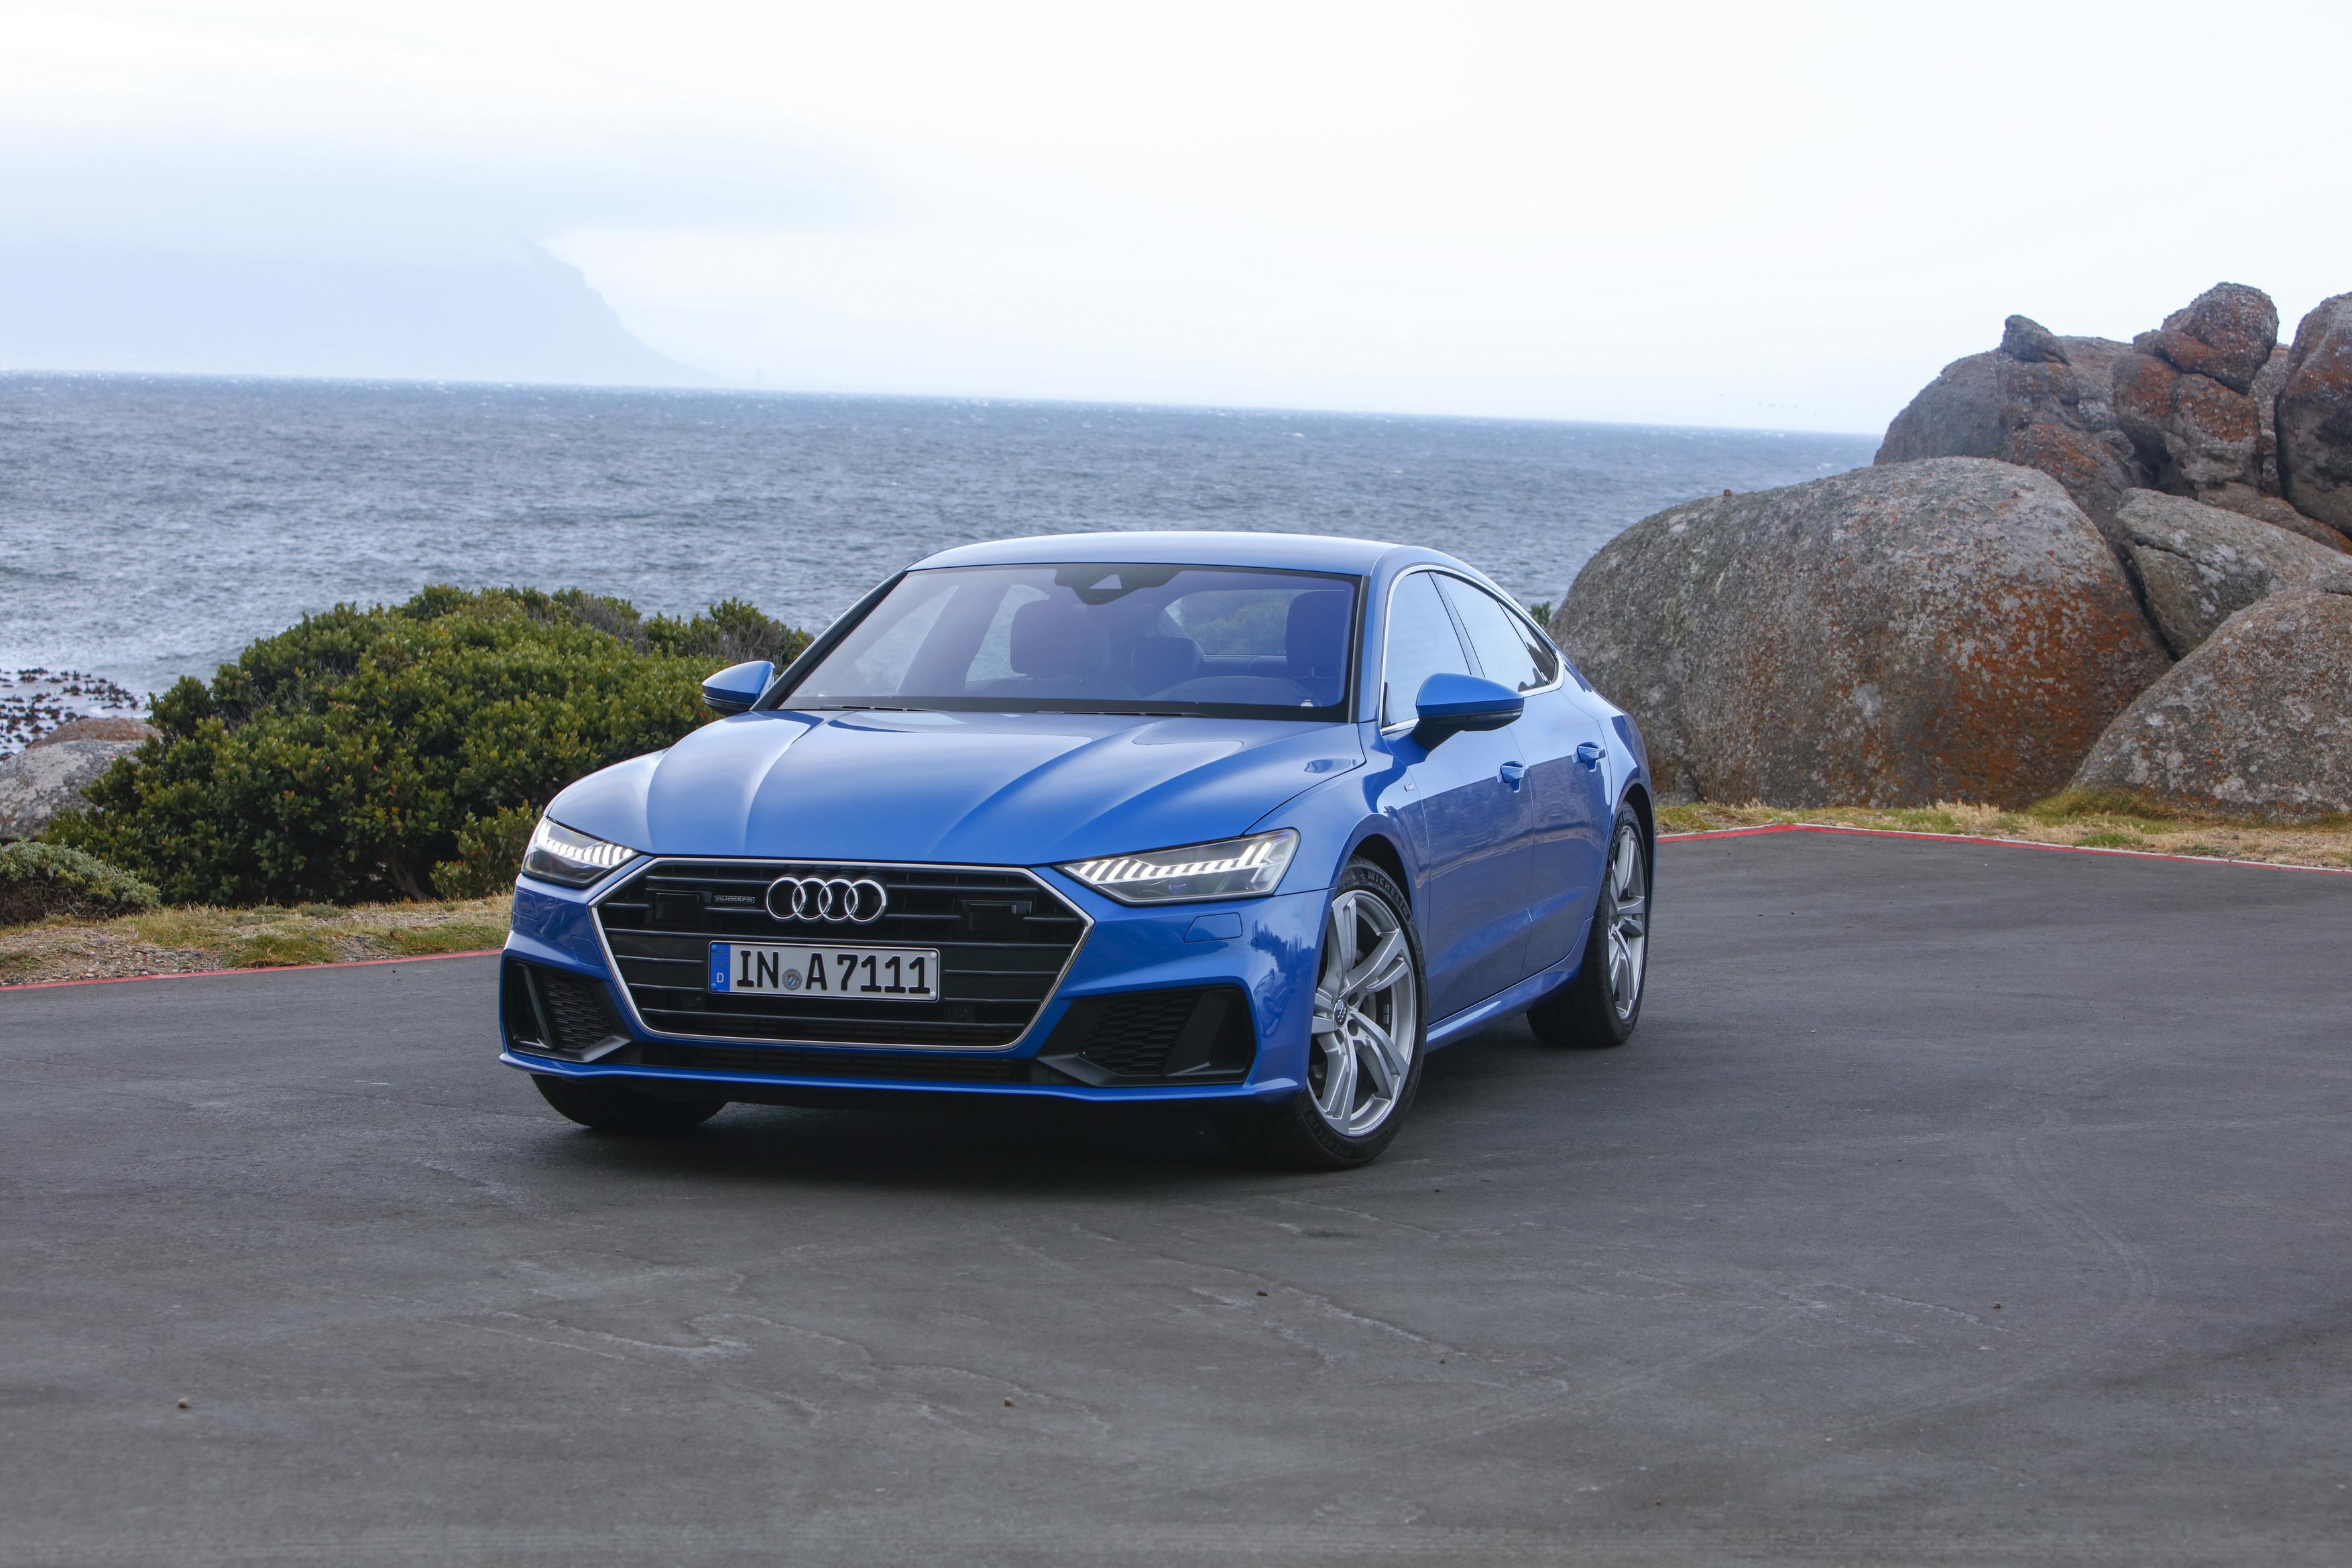 Audi A7 Sportback 2019 azul frente